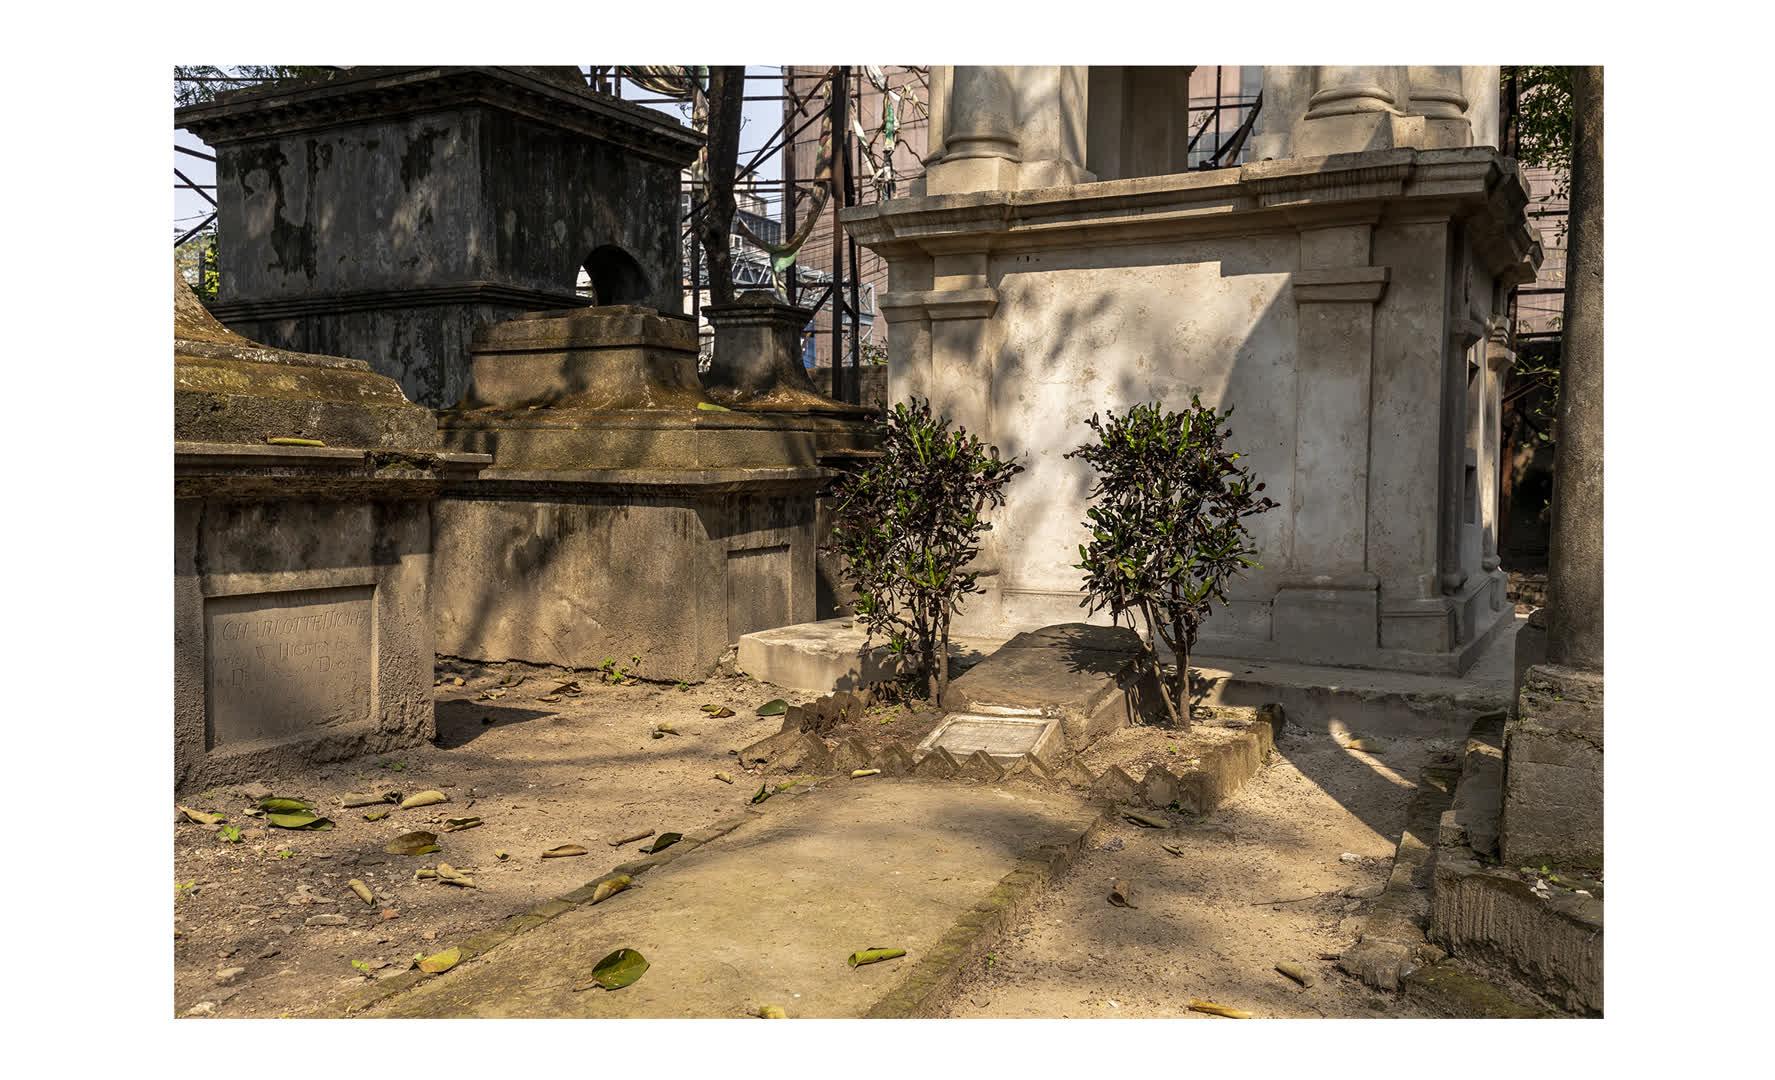 Kolkata Cemetery: What the Dickens!